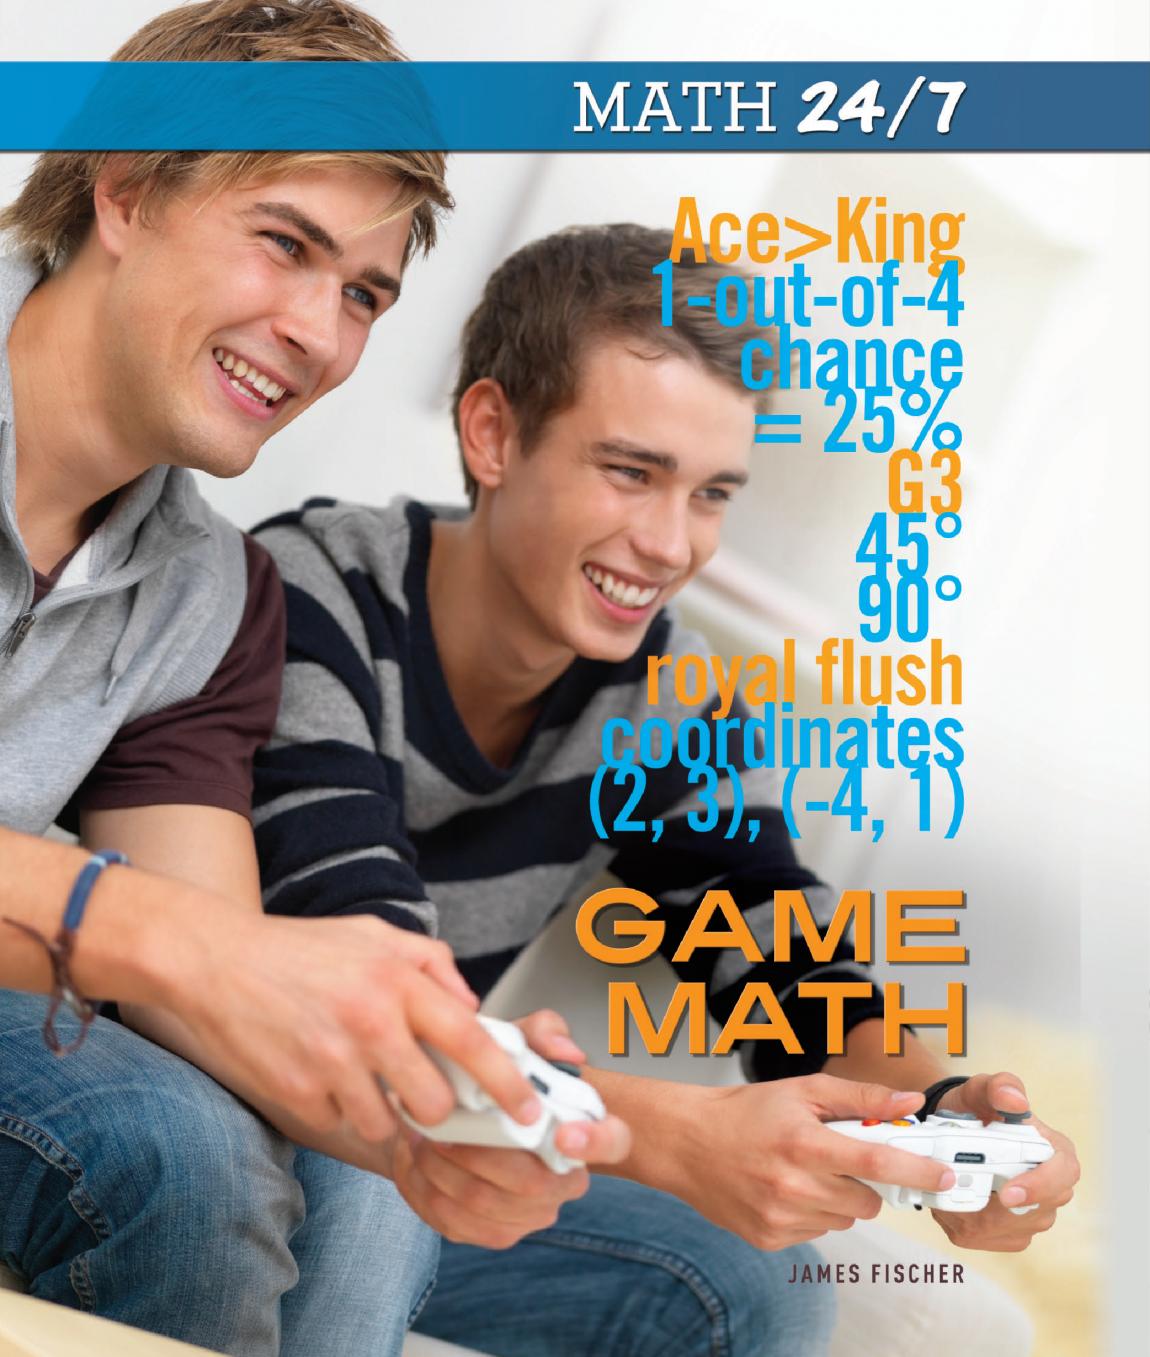 game-math-01.png